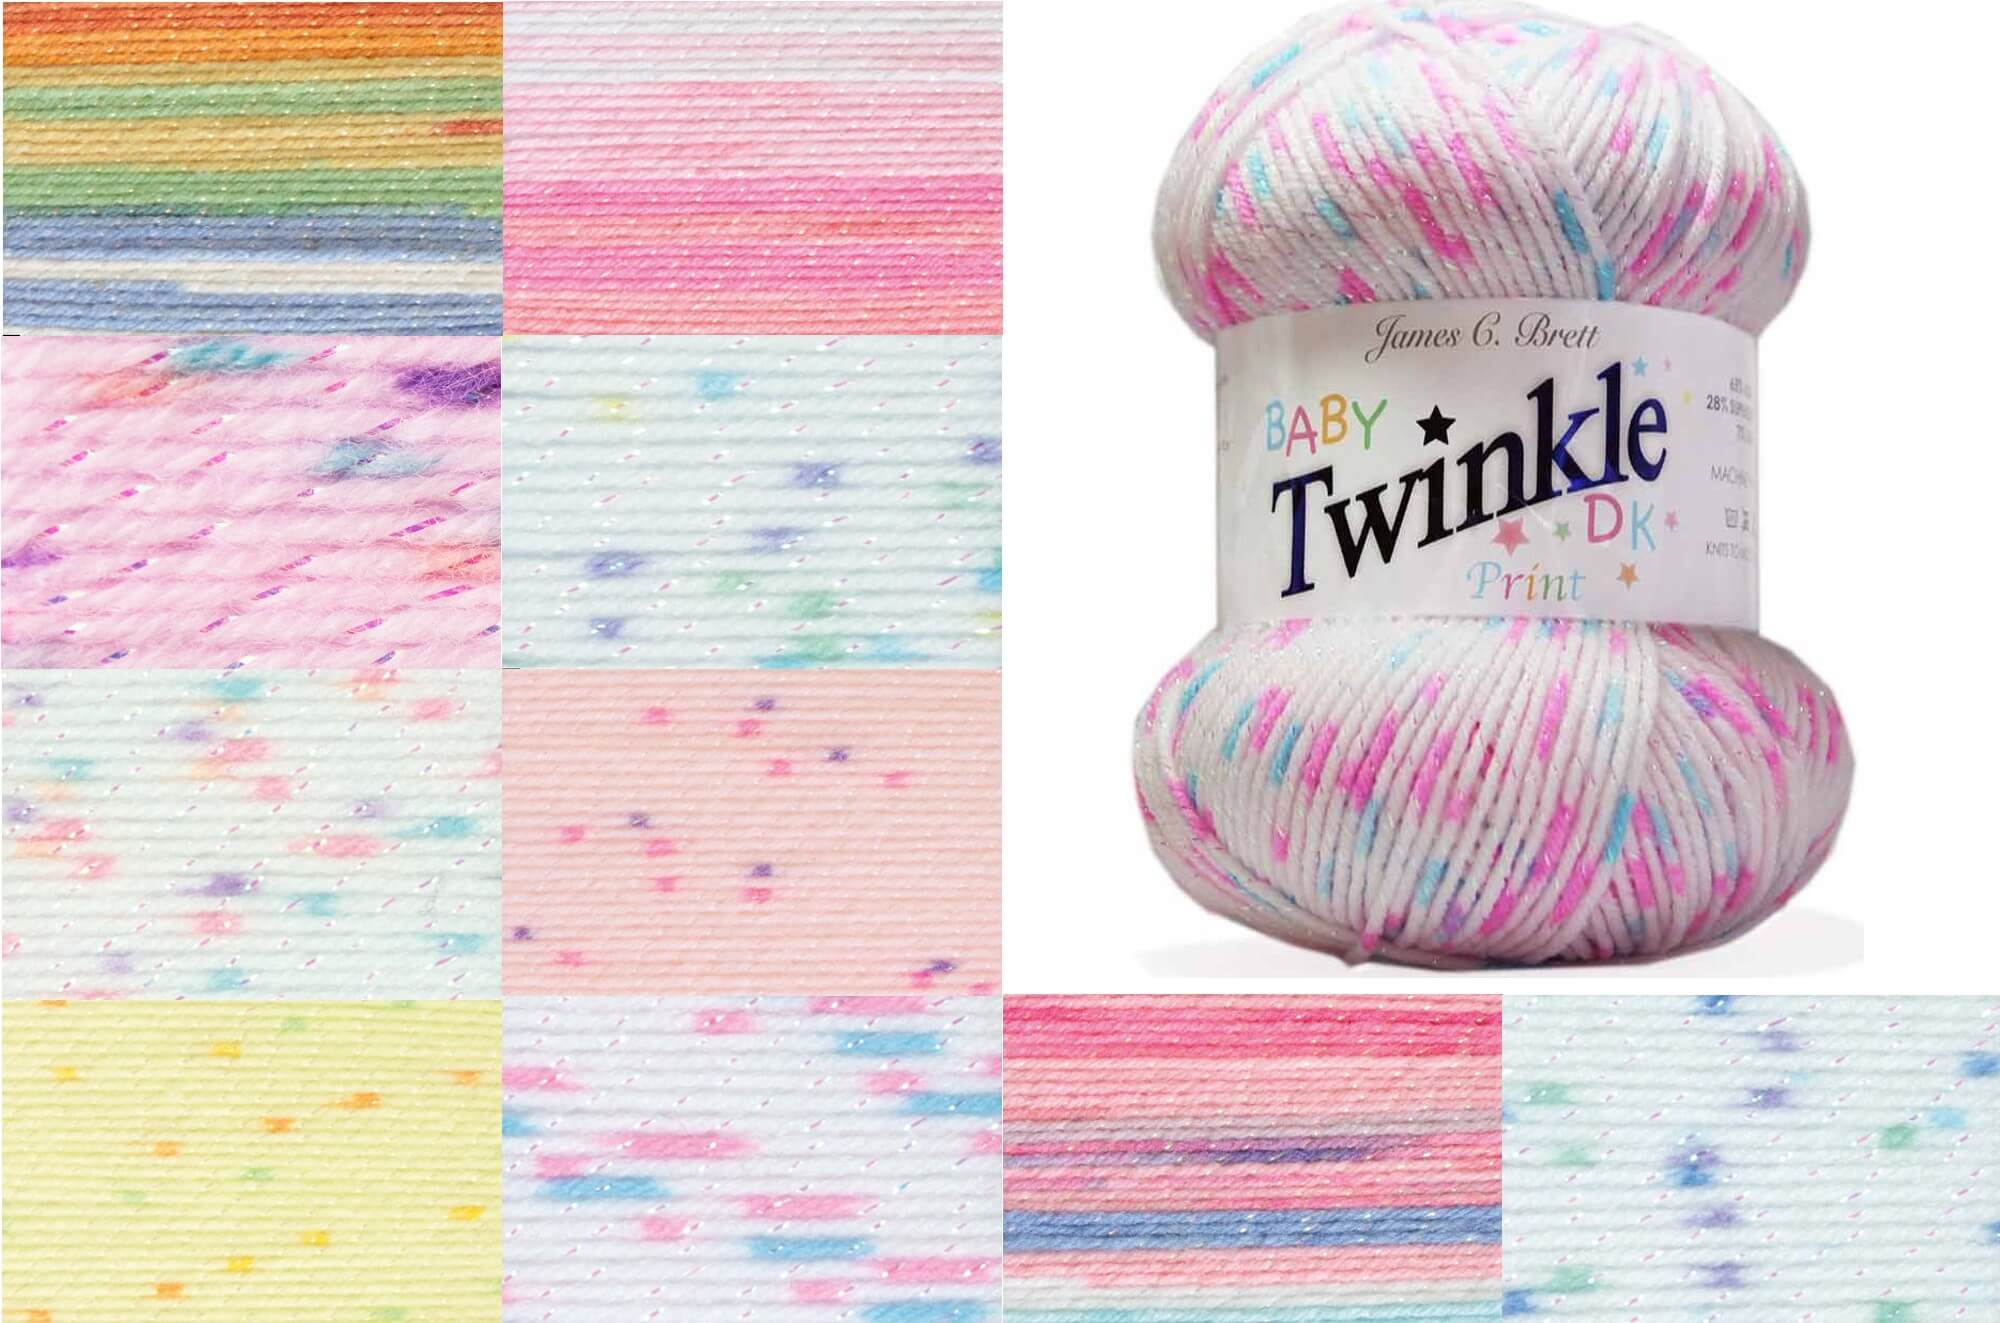 James C Brett Baby Twinkle Print DK Yarn 100g Ball Knitting Yarn Knit Craft BTP1